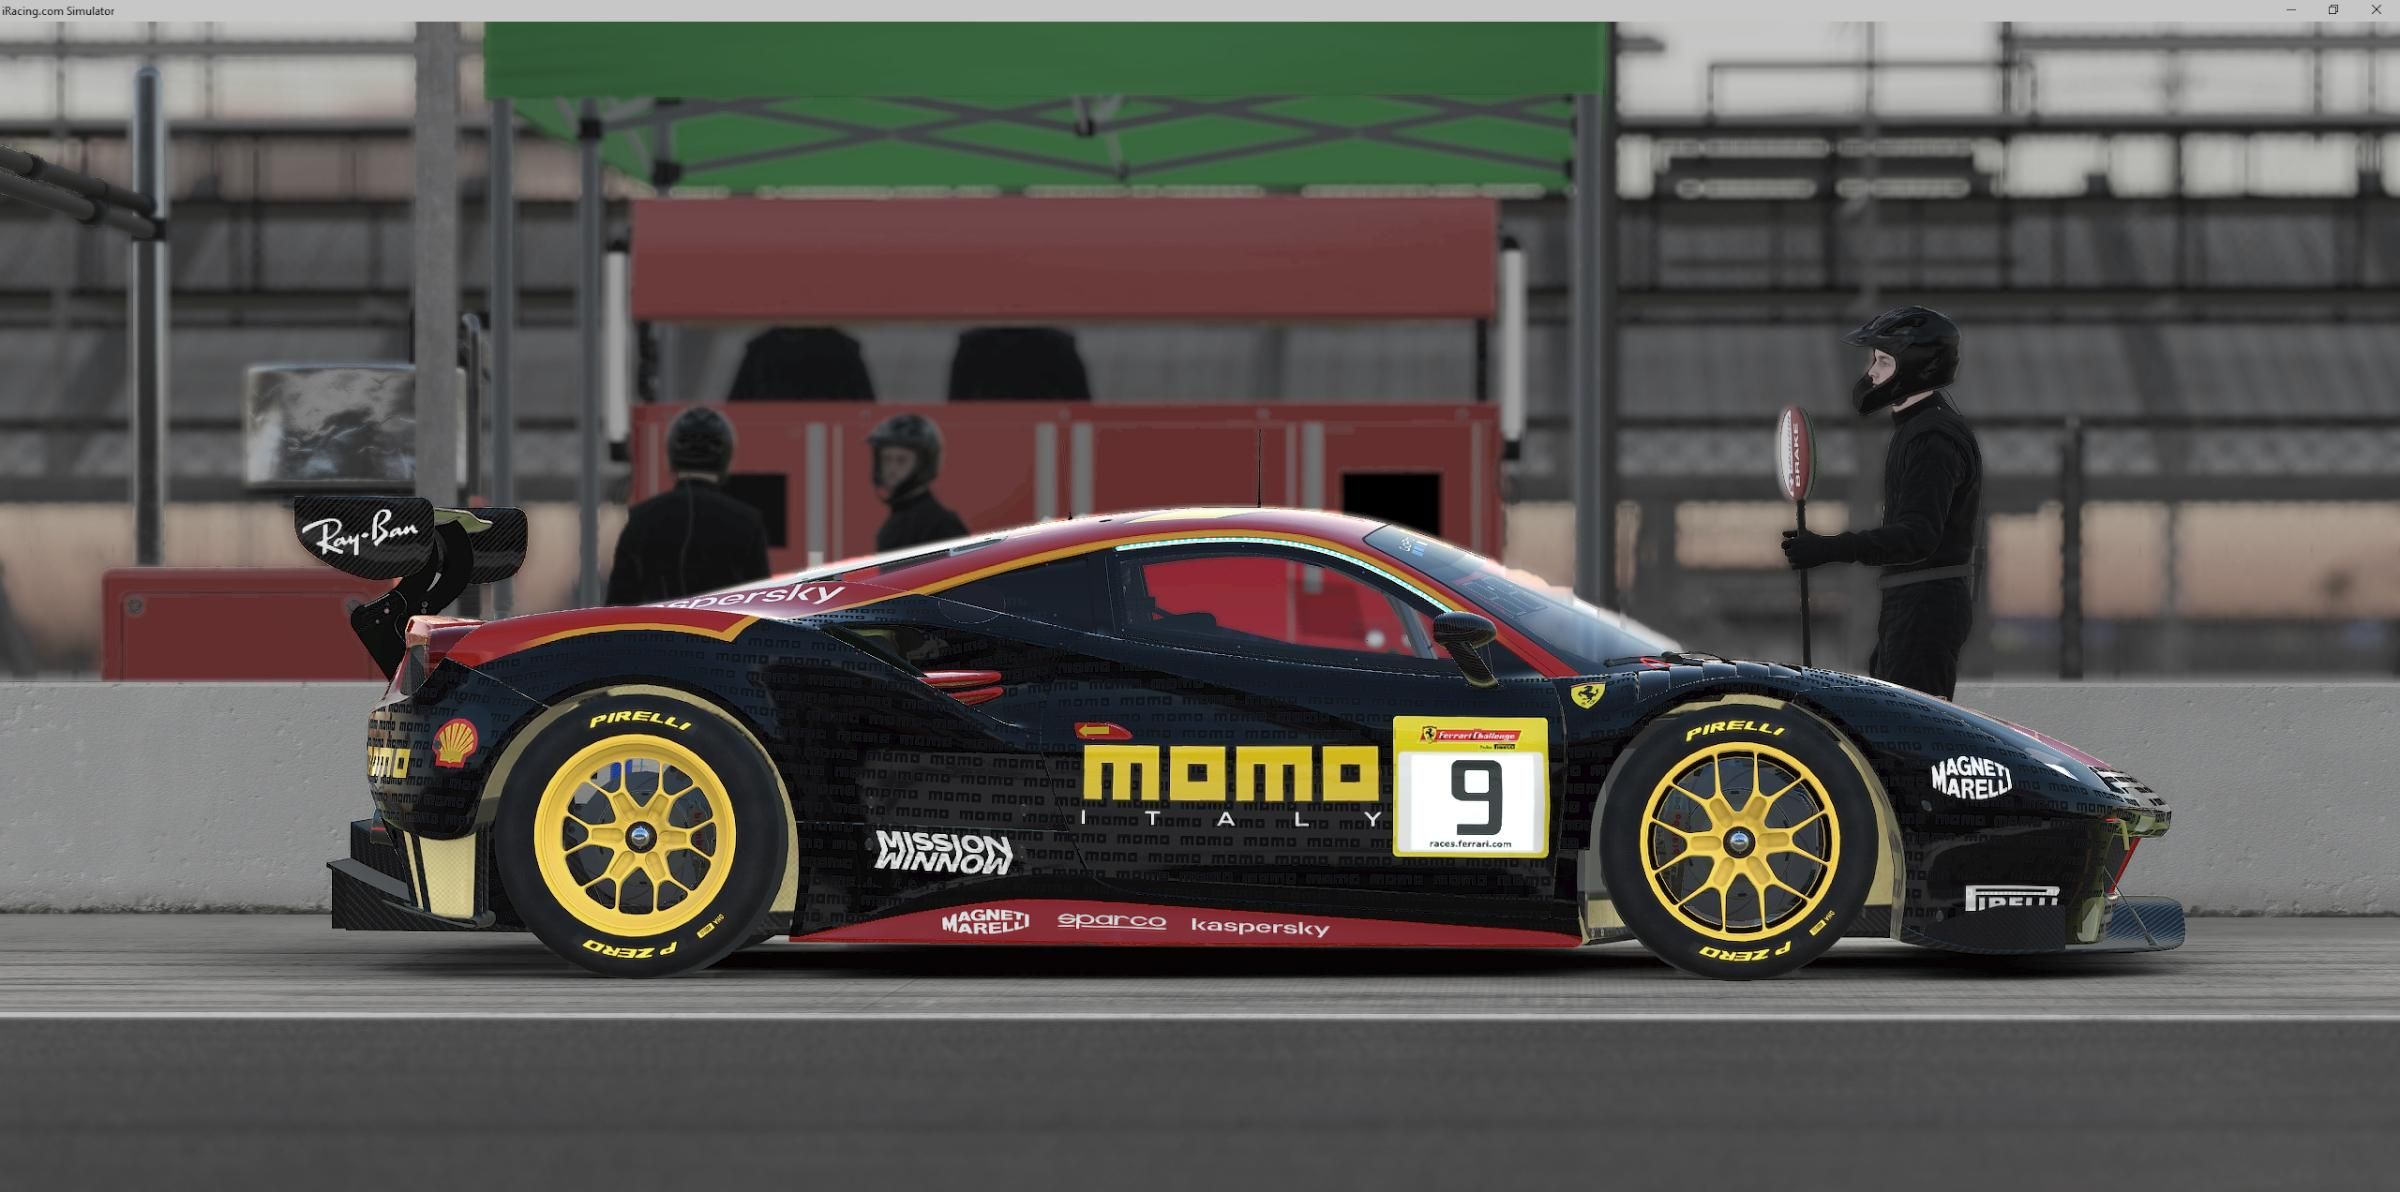 Preview of Ferrari 488 GT3 MOMO by Jérôme Bajulaz